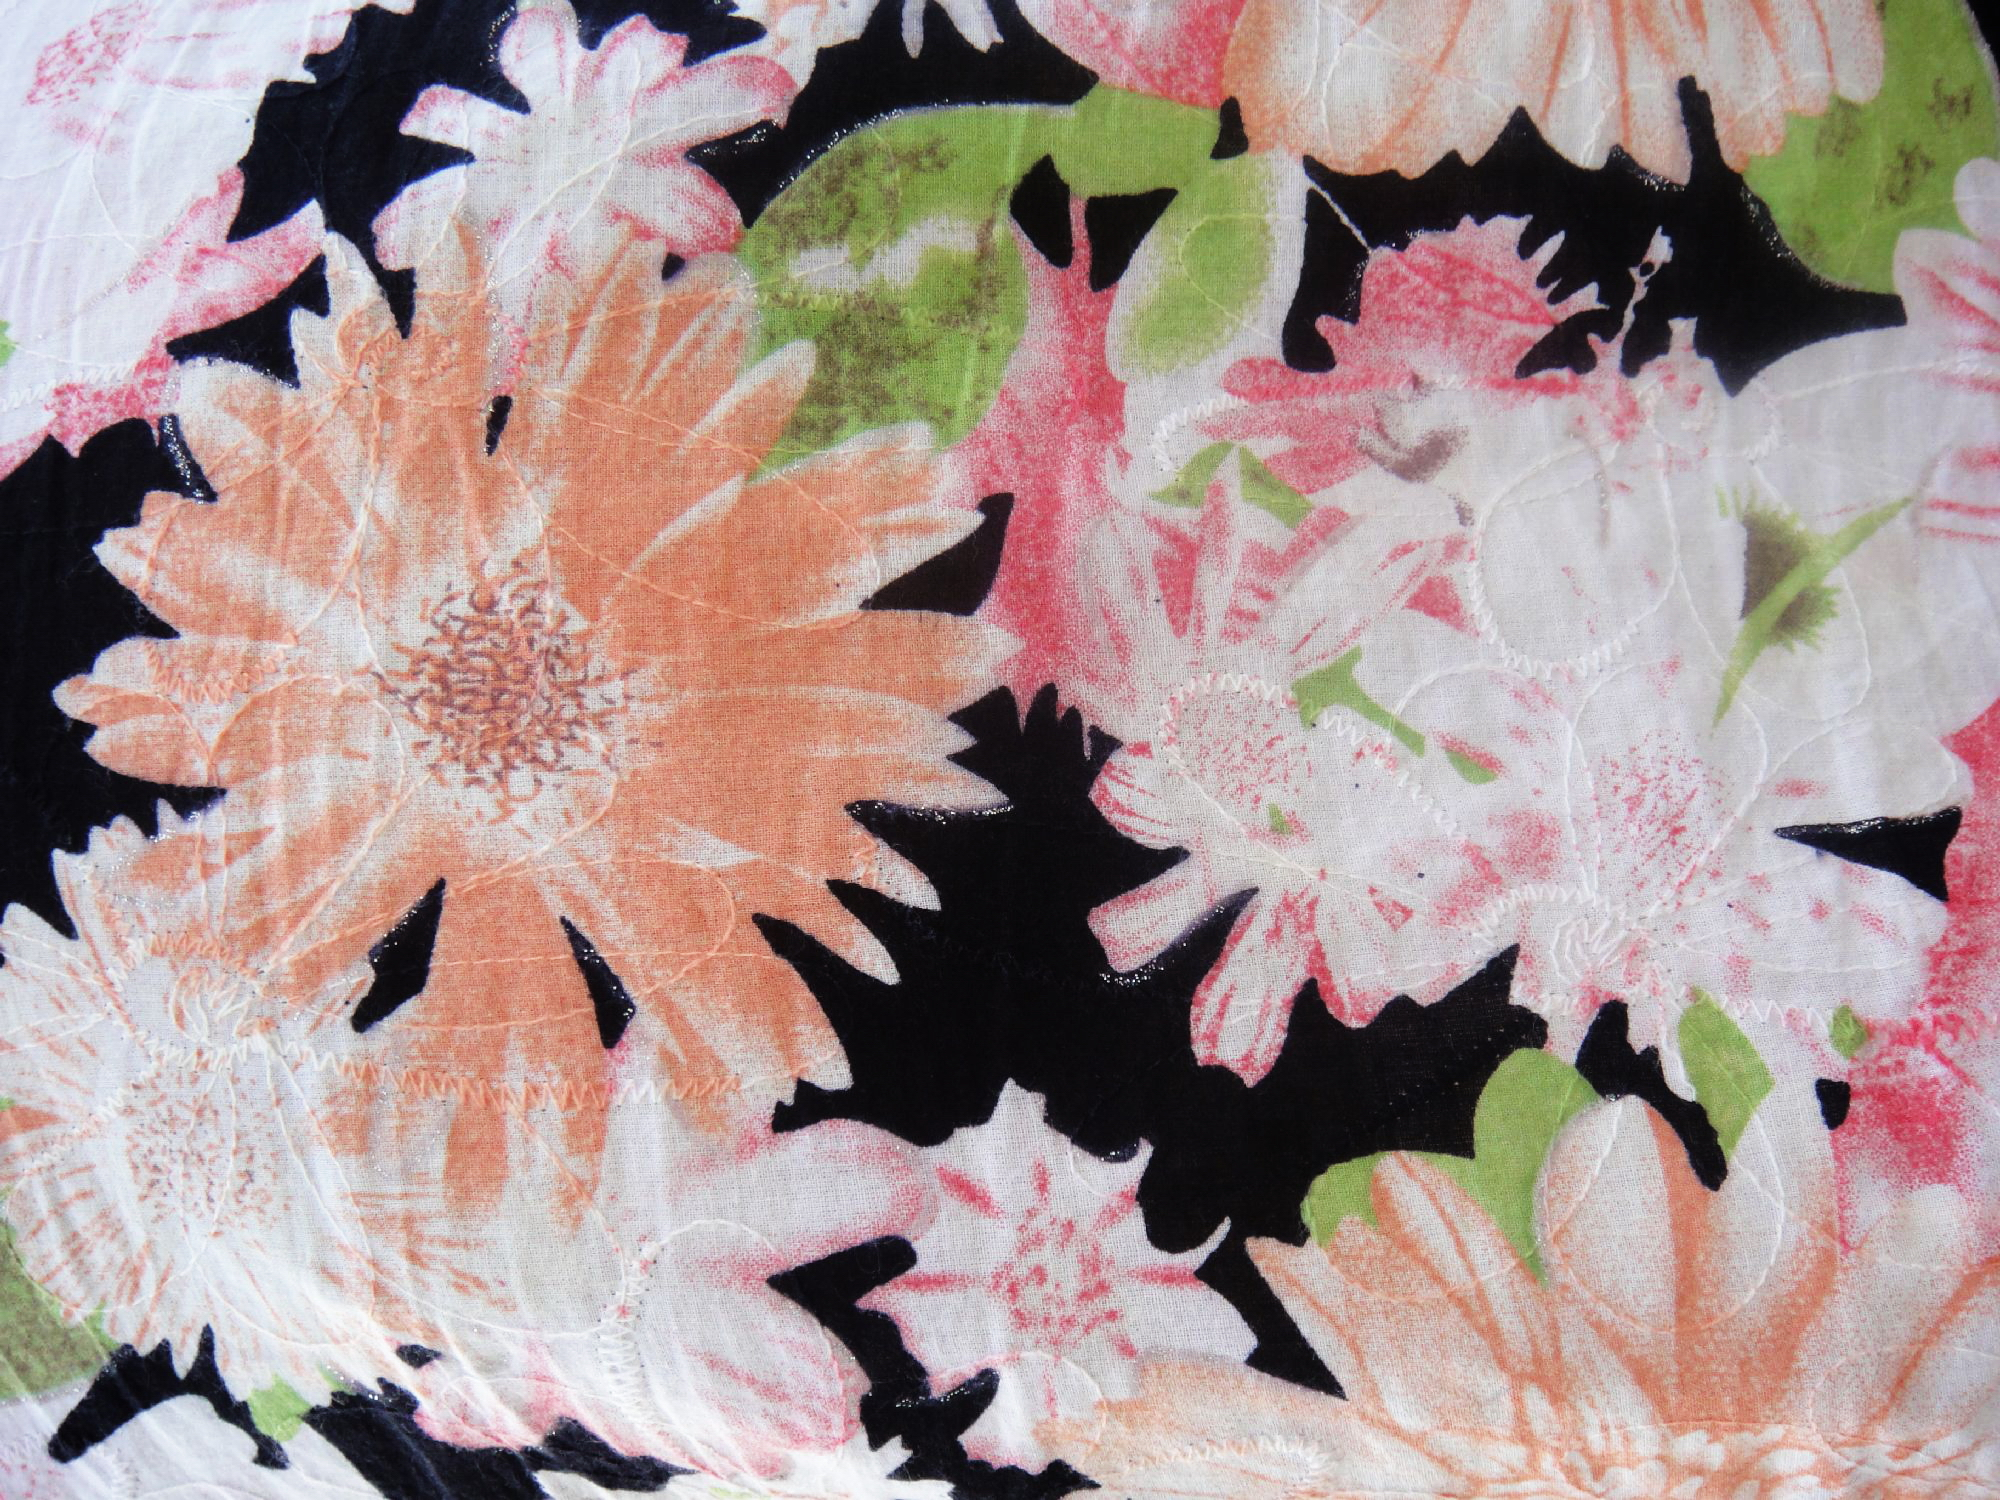 Flowers design, Antique, Teared, Scrapbook, Set, HQ Photo